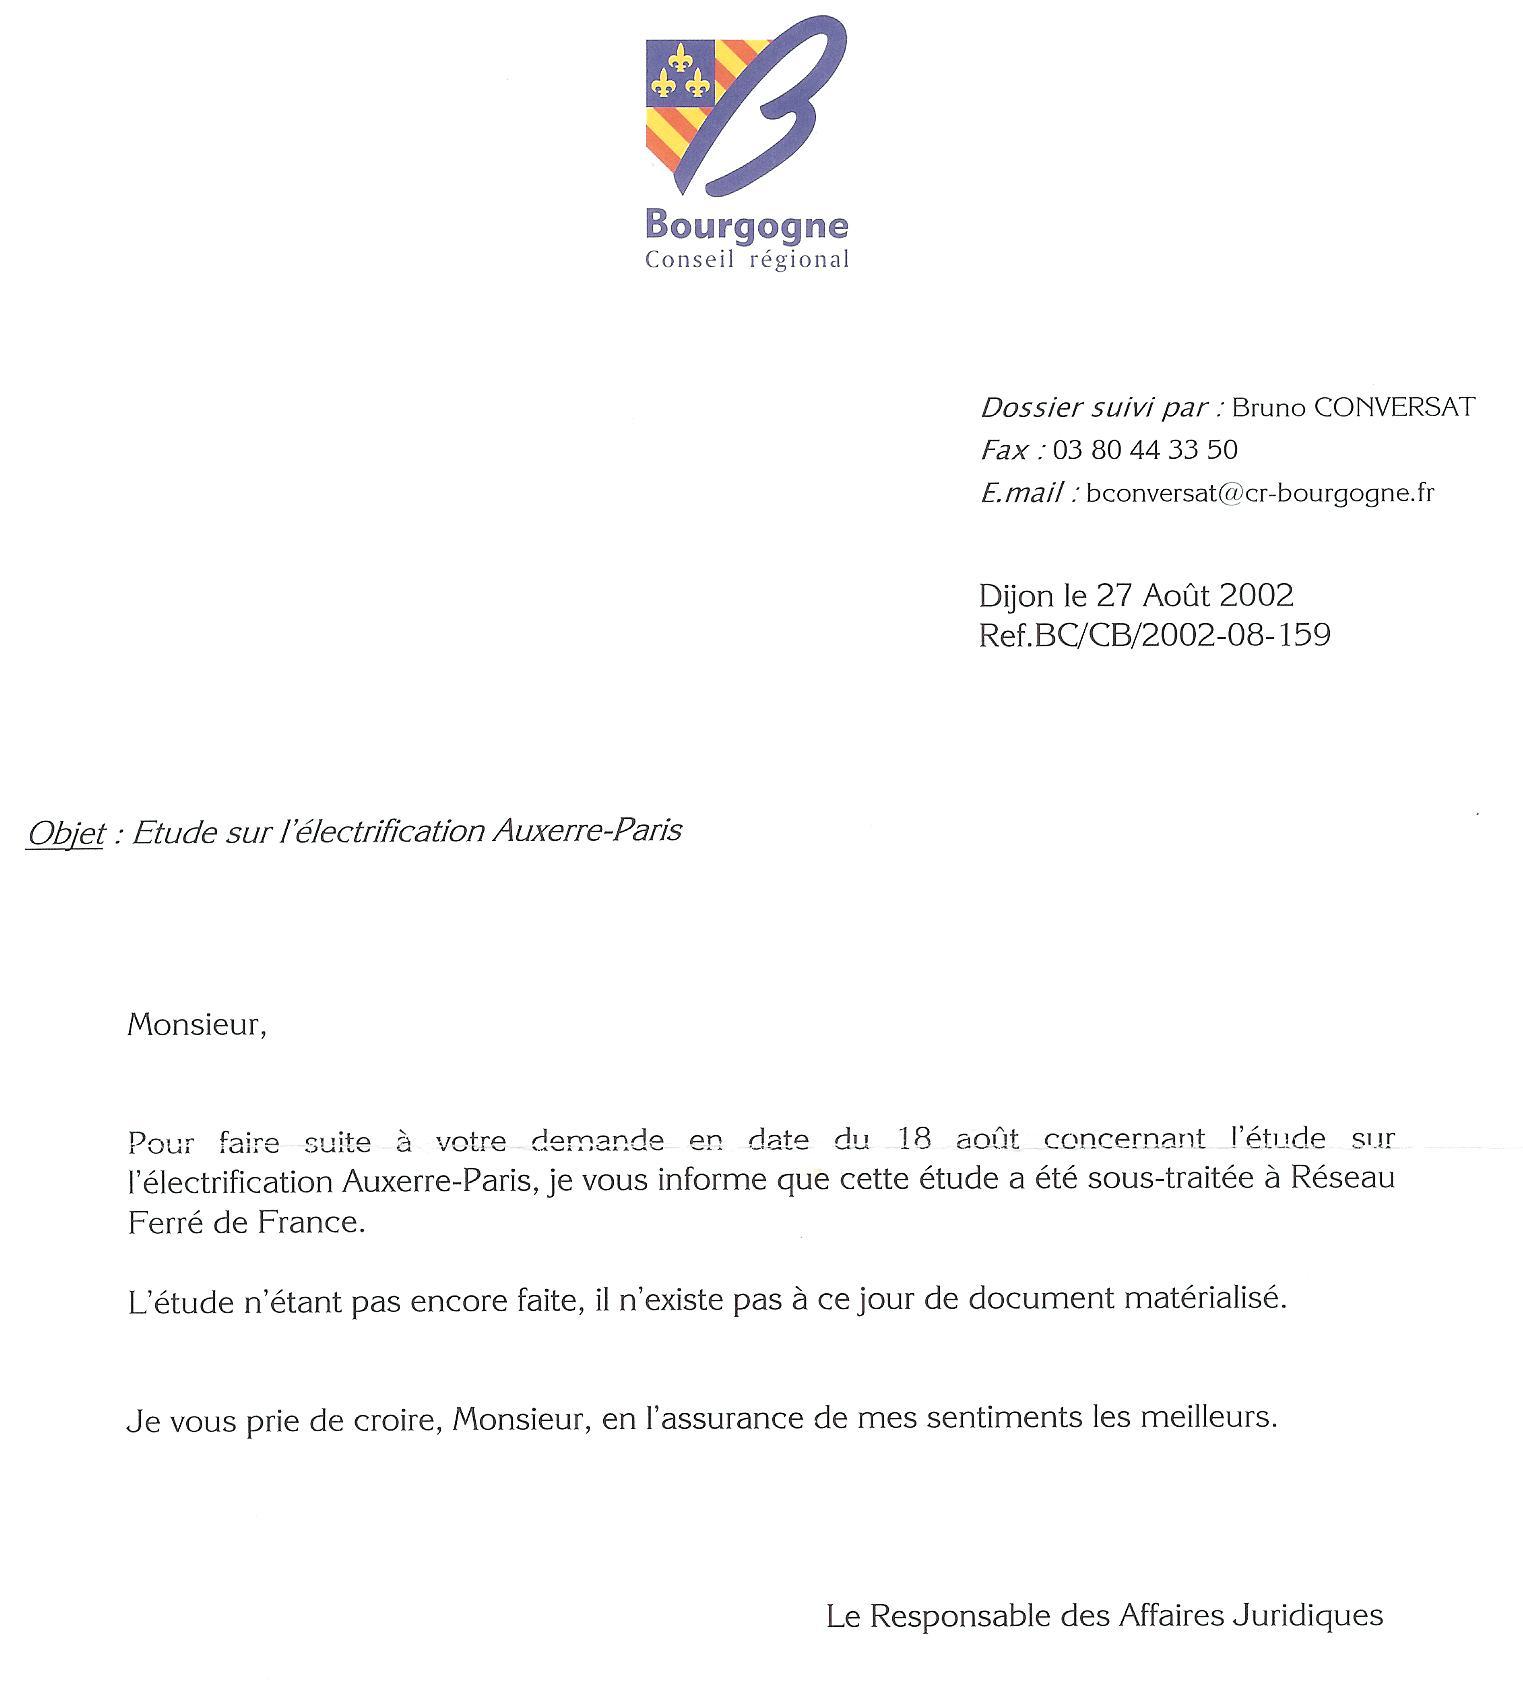 etude-auxerre-laroche-rff-2002-08-27